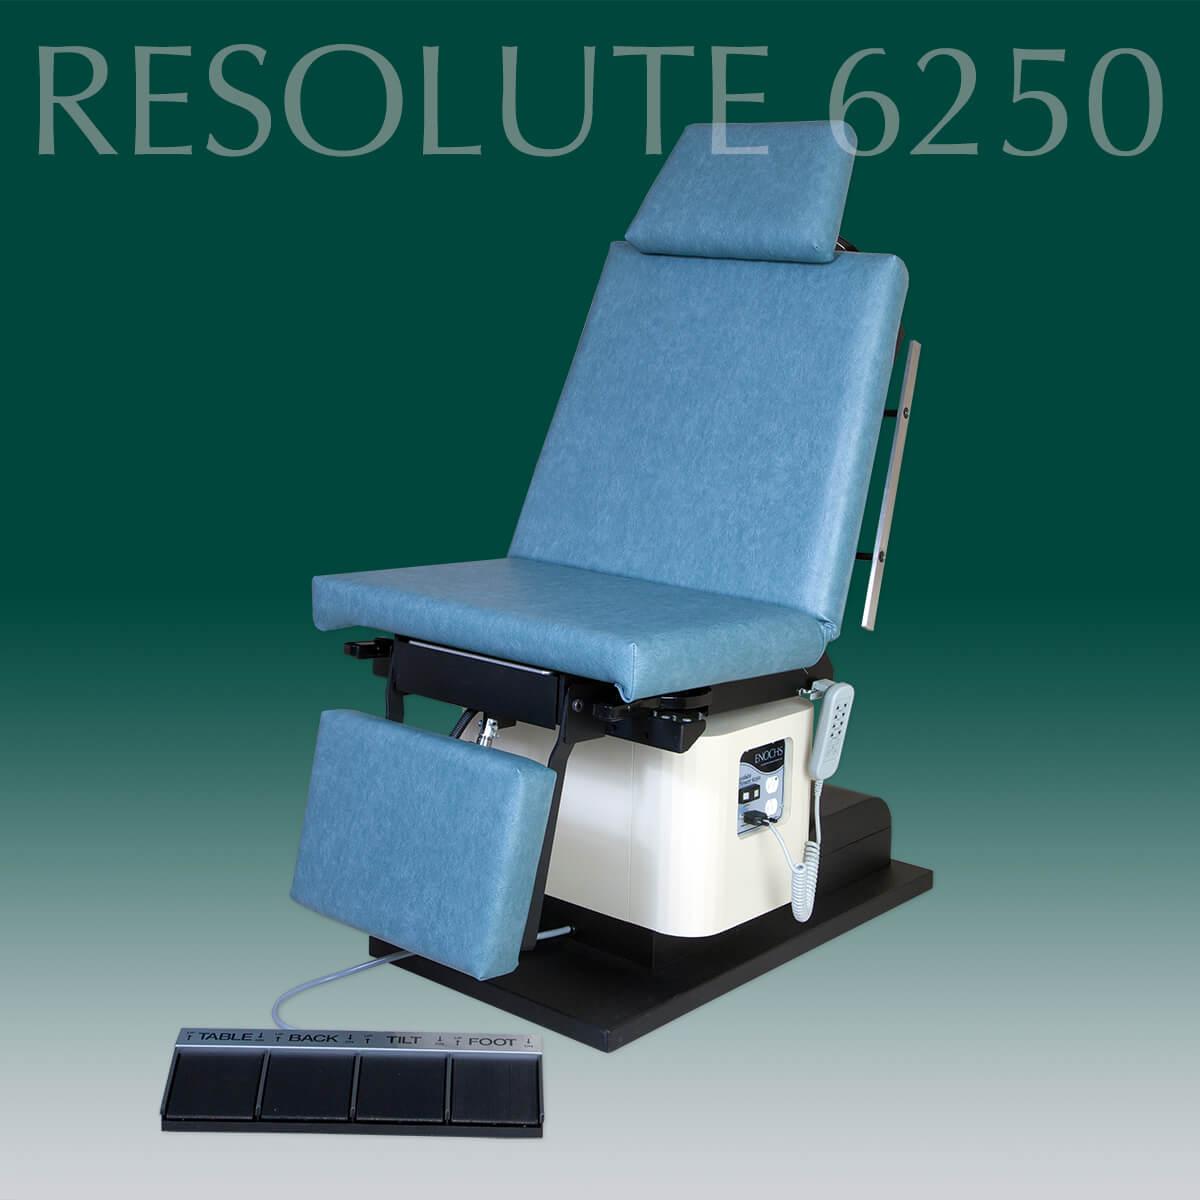 RESOLUTE-6250-GREEN.jpg